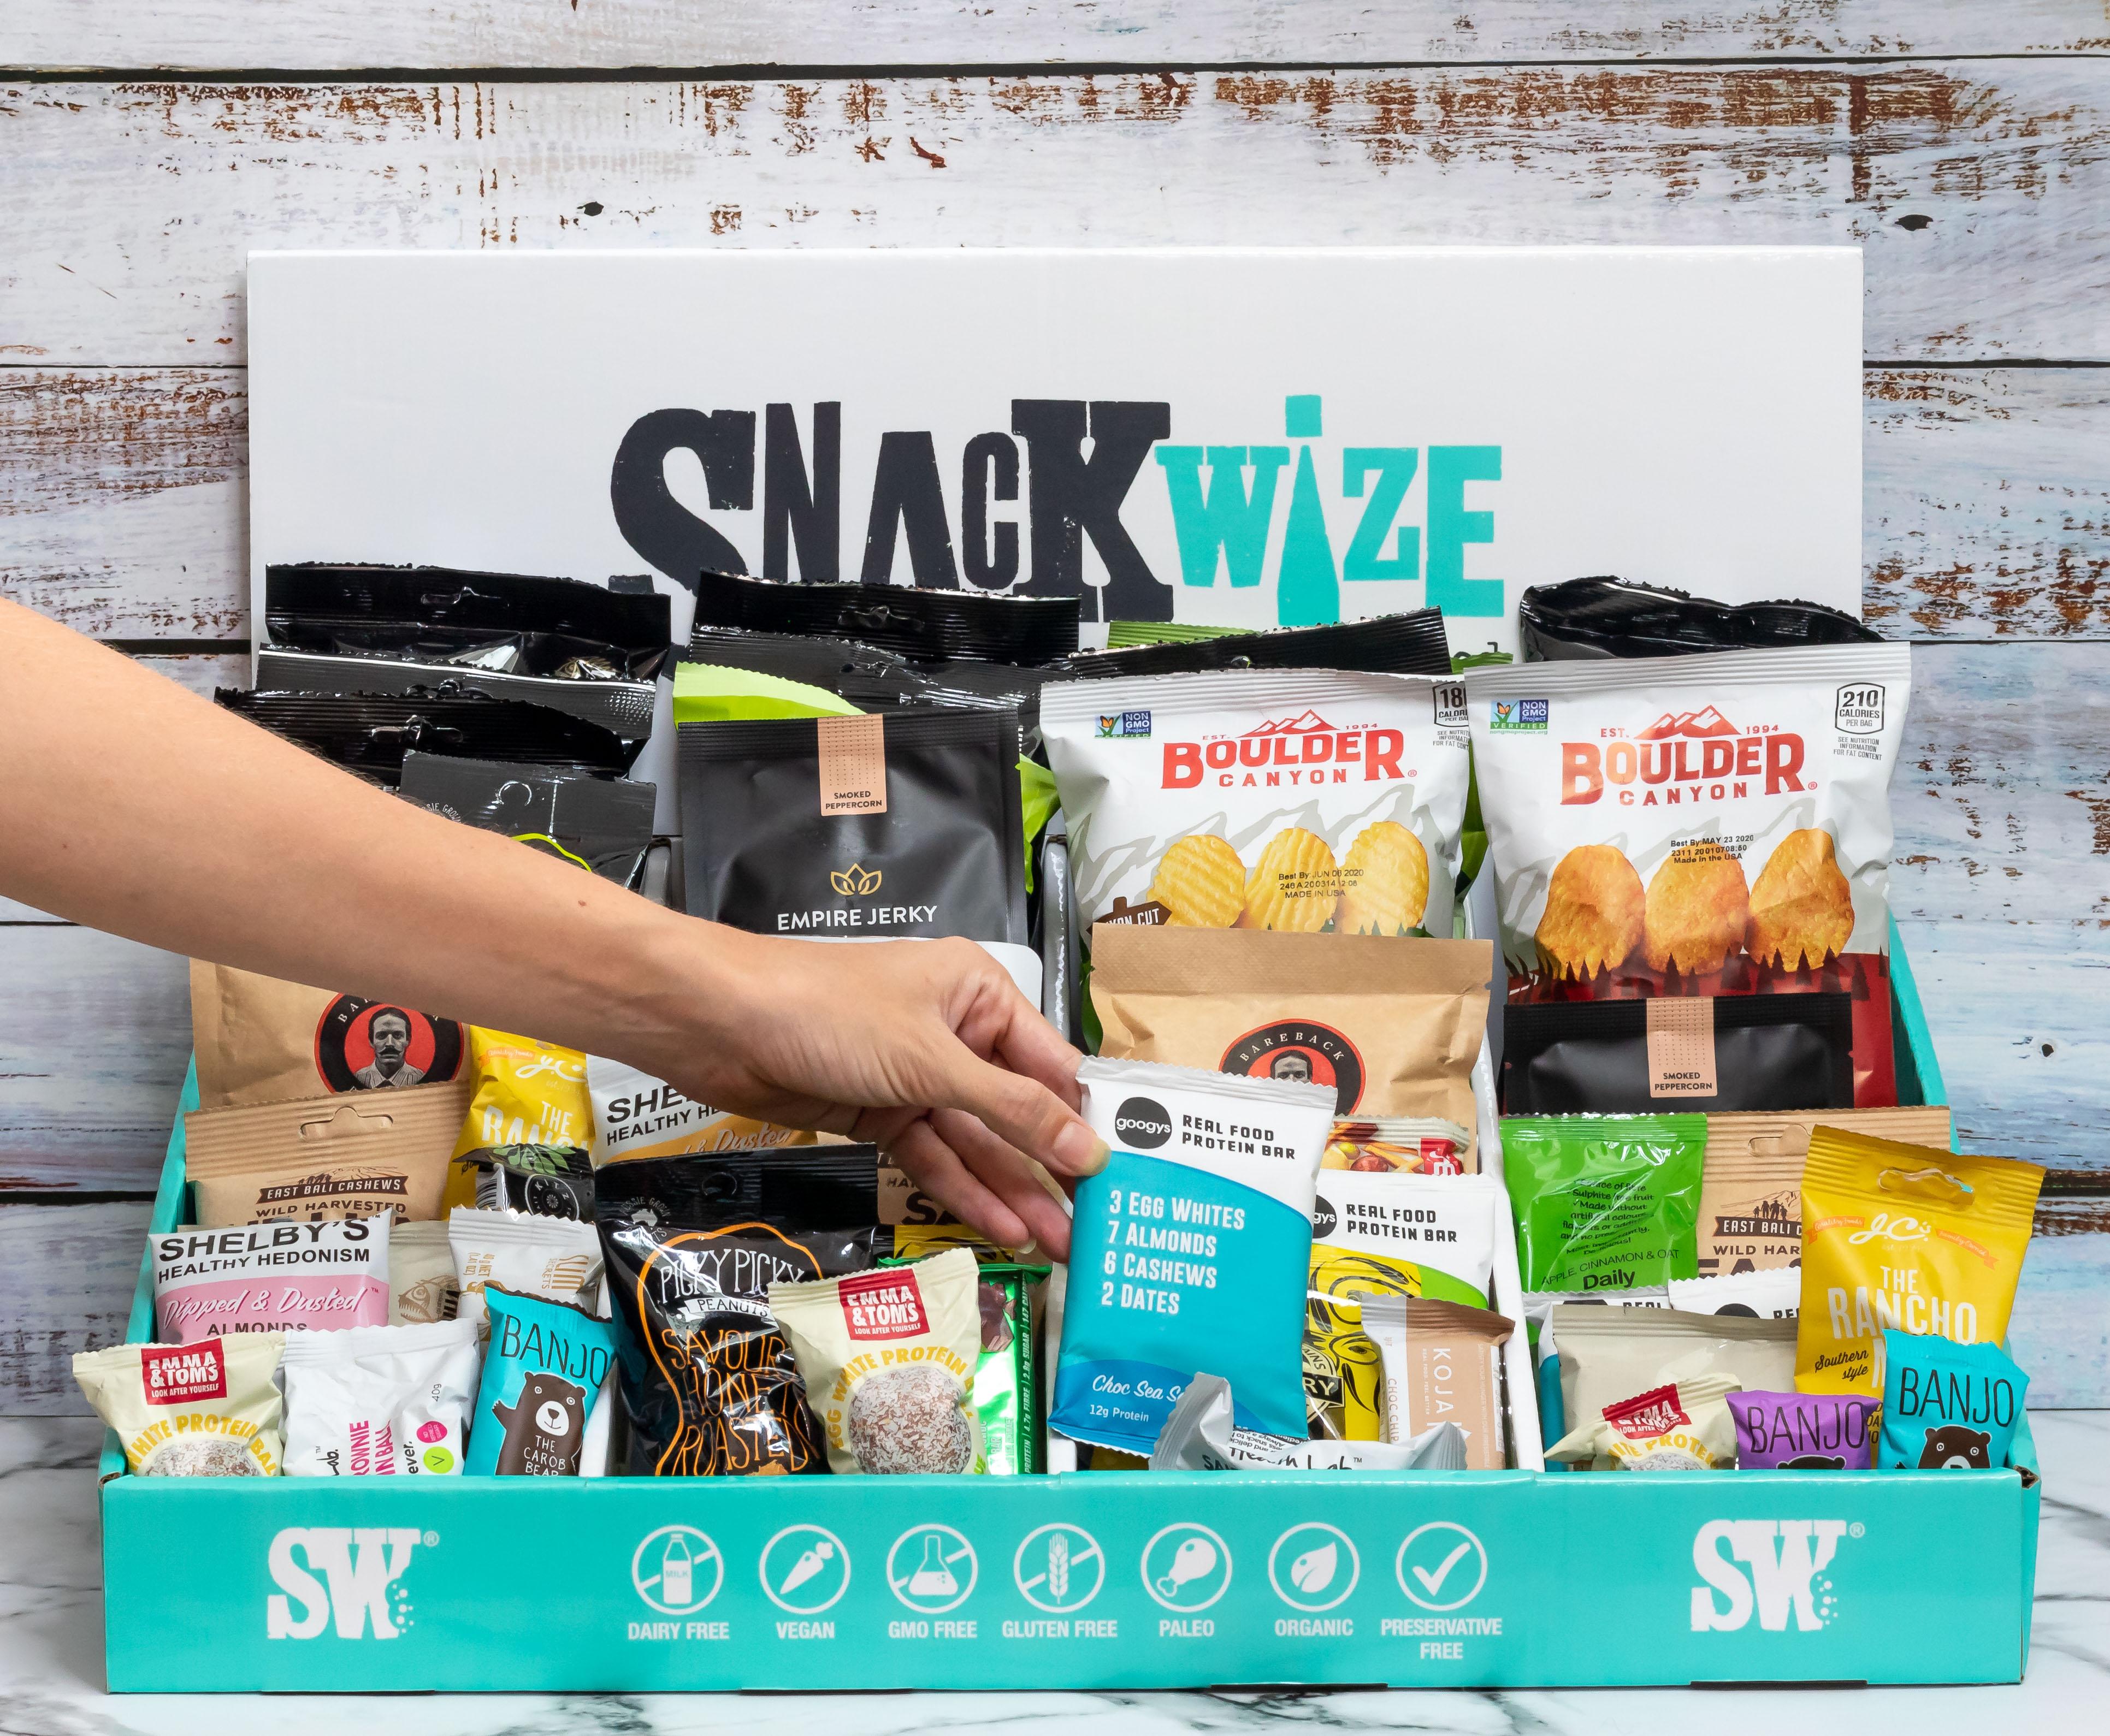 Snackwize - Healthy Snacks